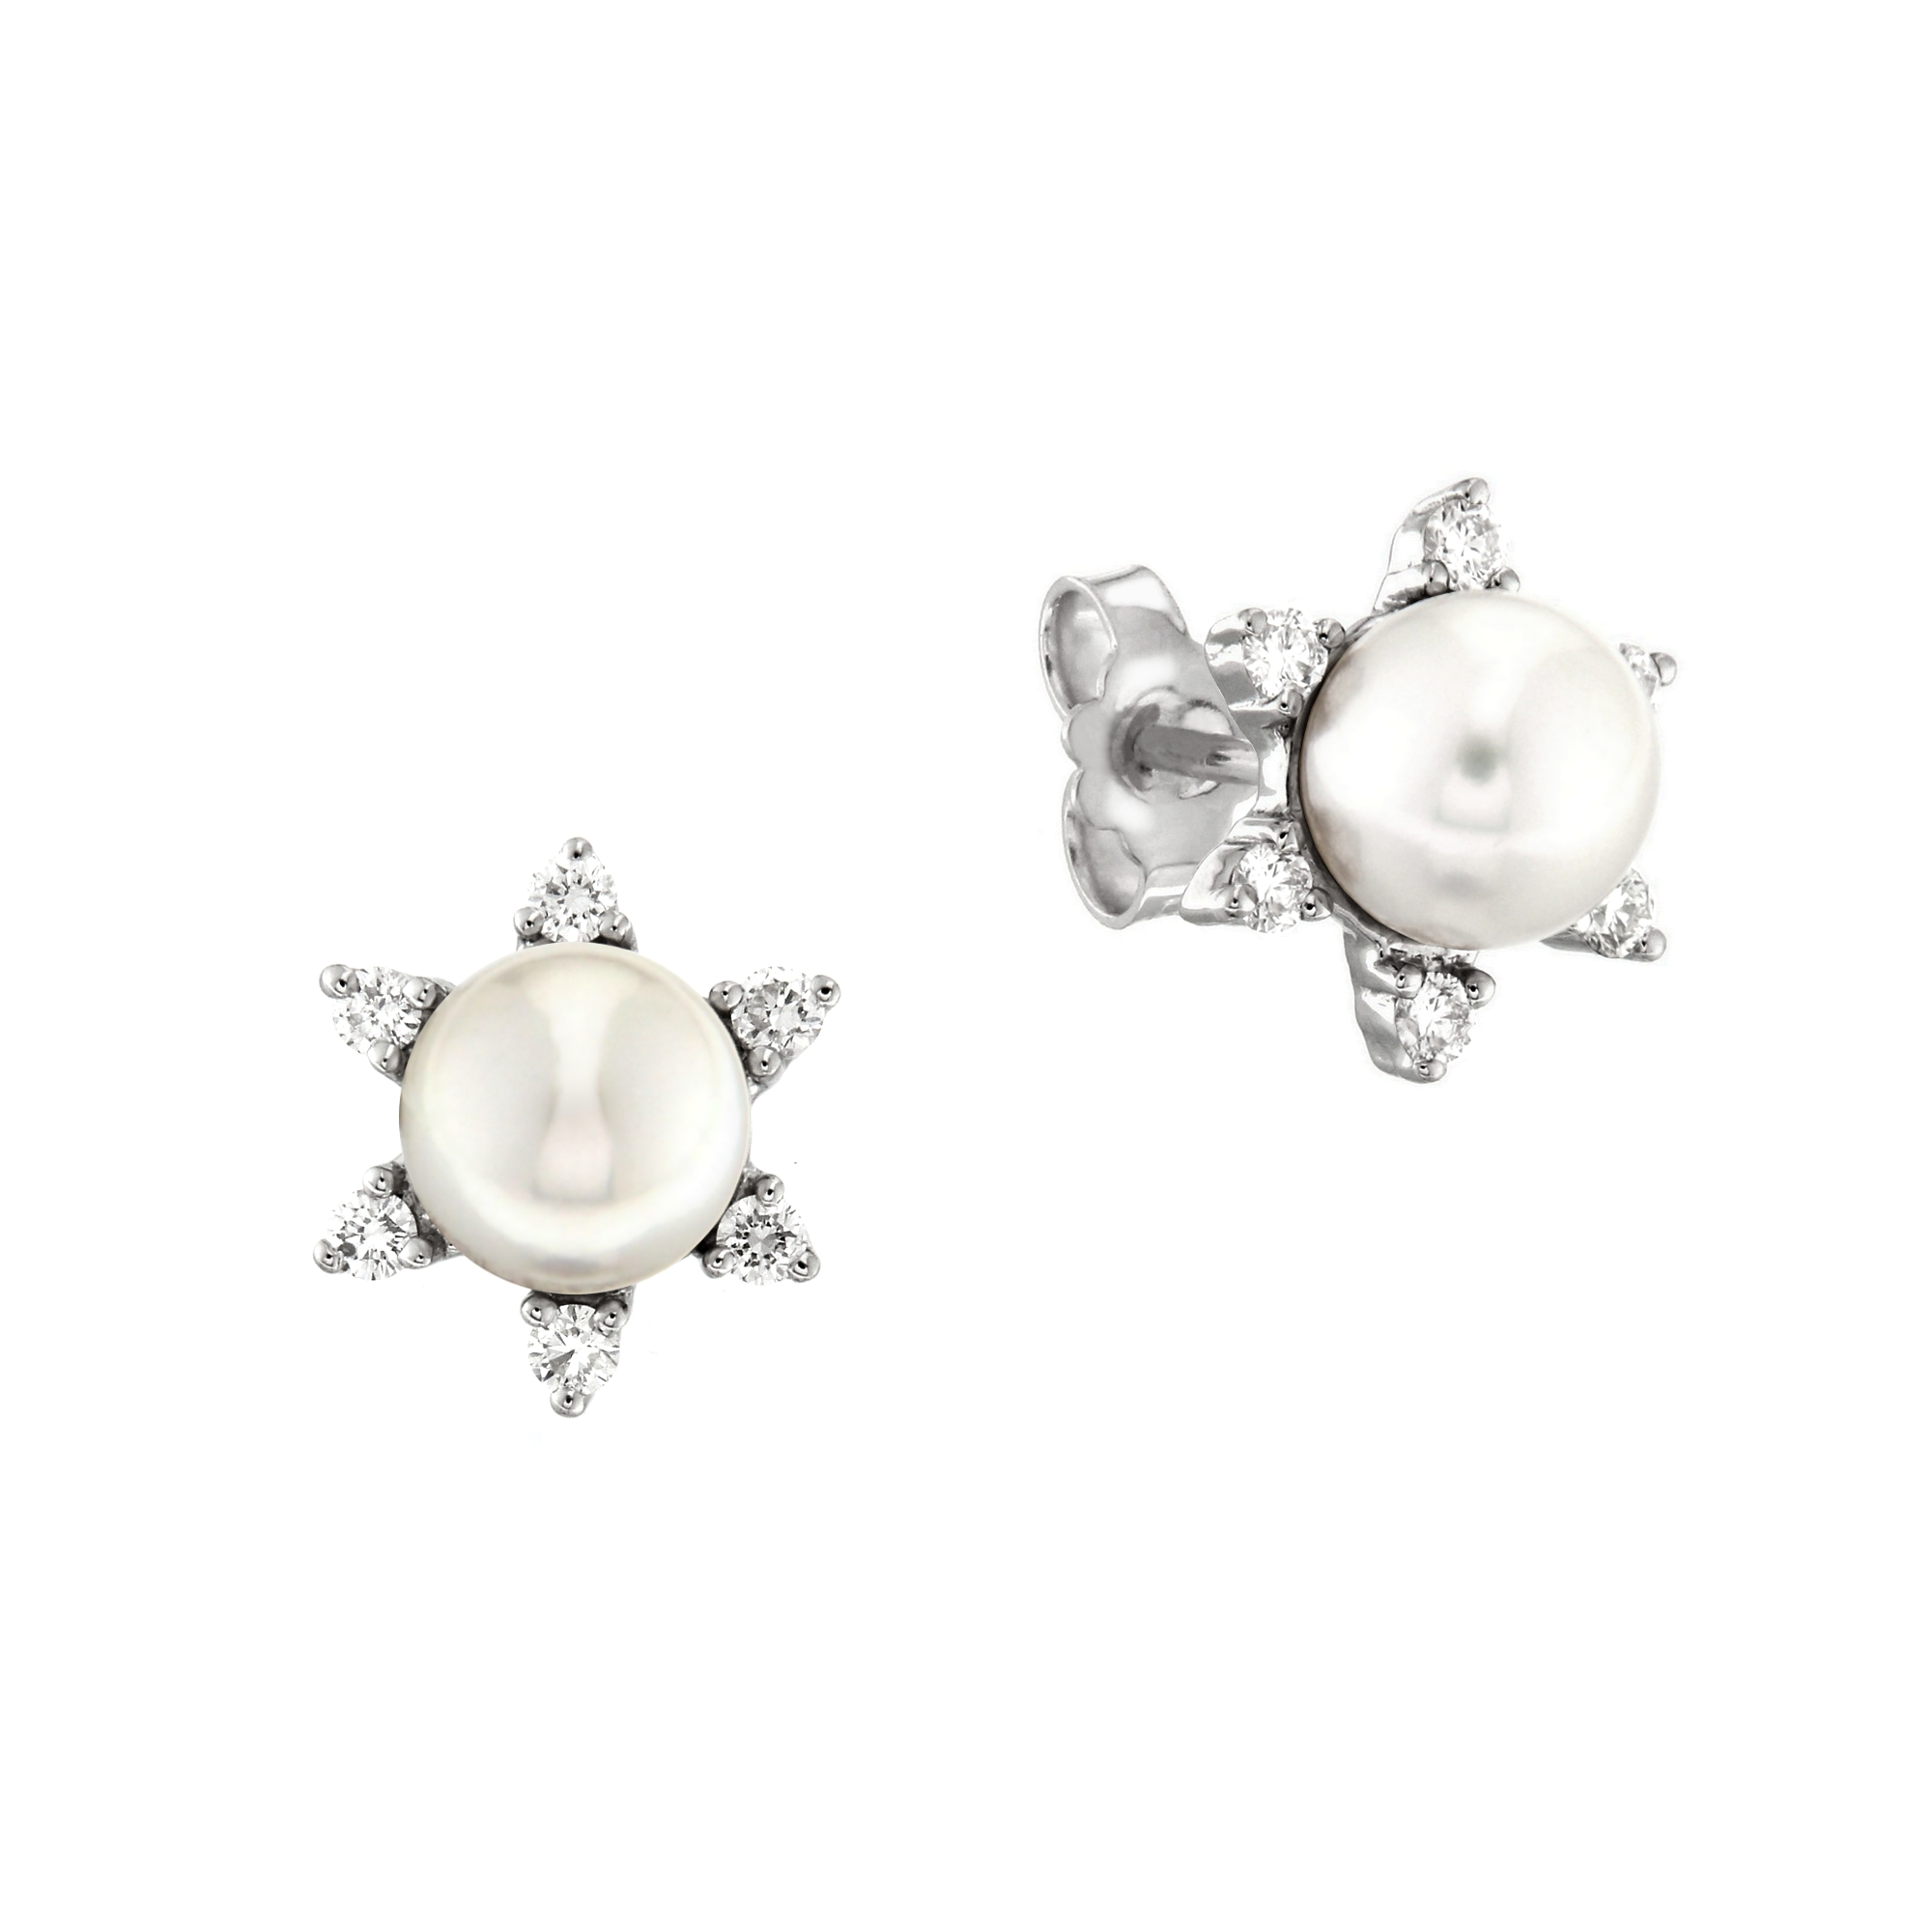 Cercei din aur 18K cu perle Akoya 1,00 gr. si diamante 0,31 ct., model Orsini OR0358